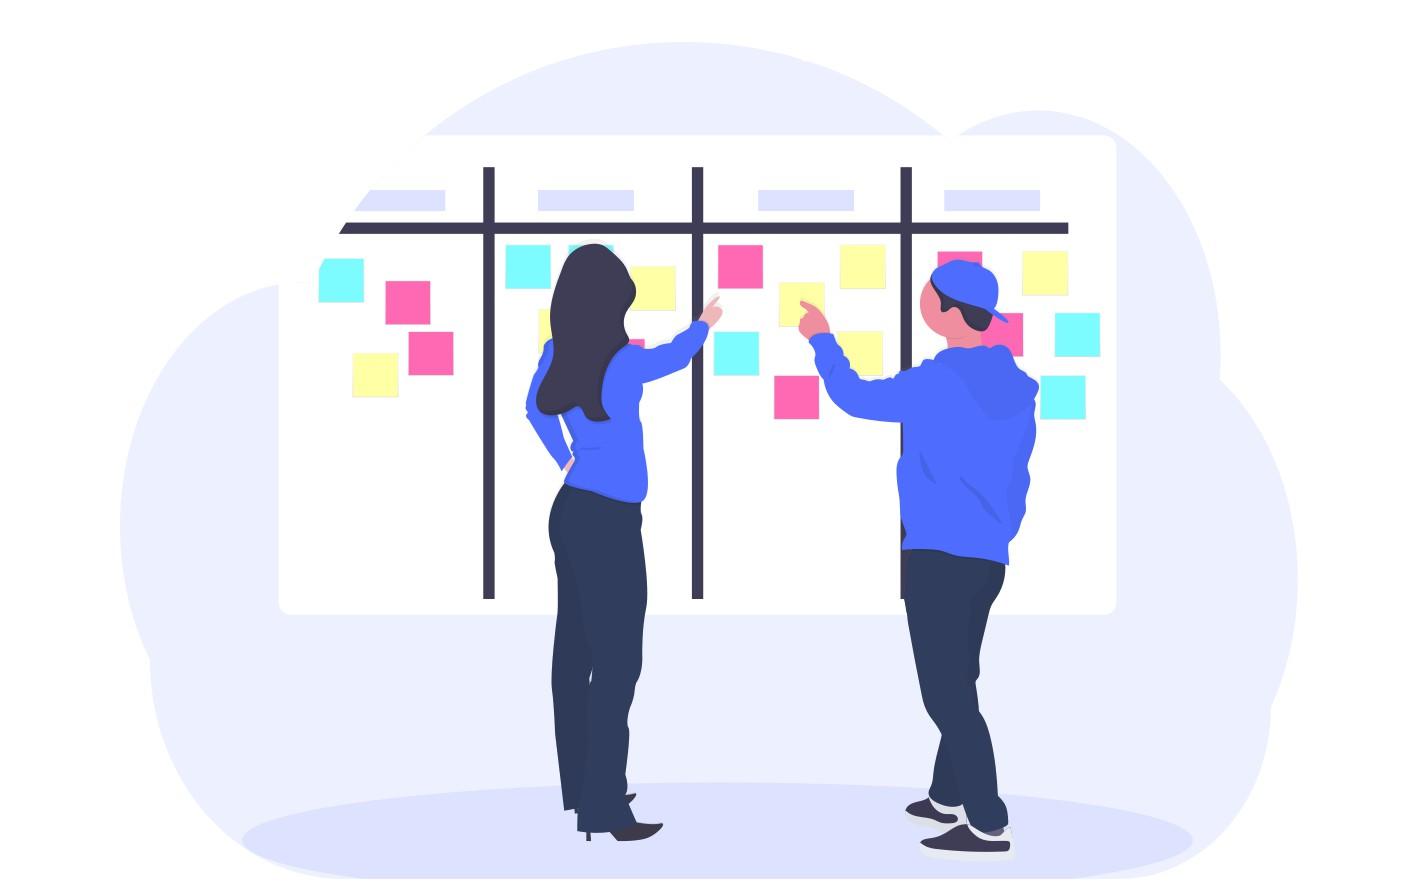 Agile vs Scrum: Differences and Similarities - DZone Agile